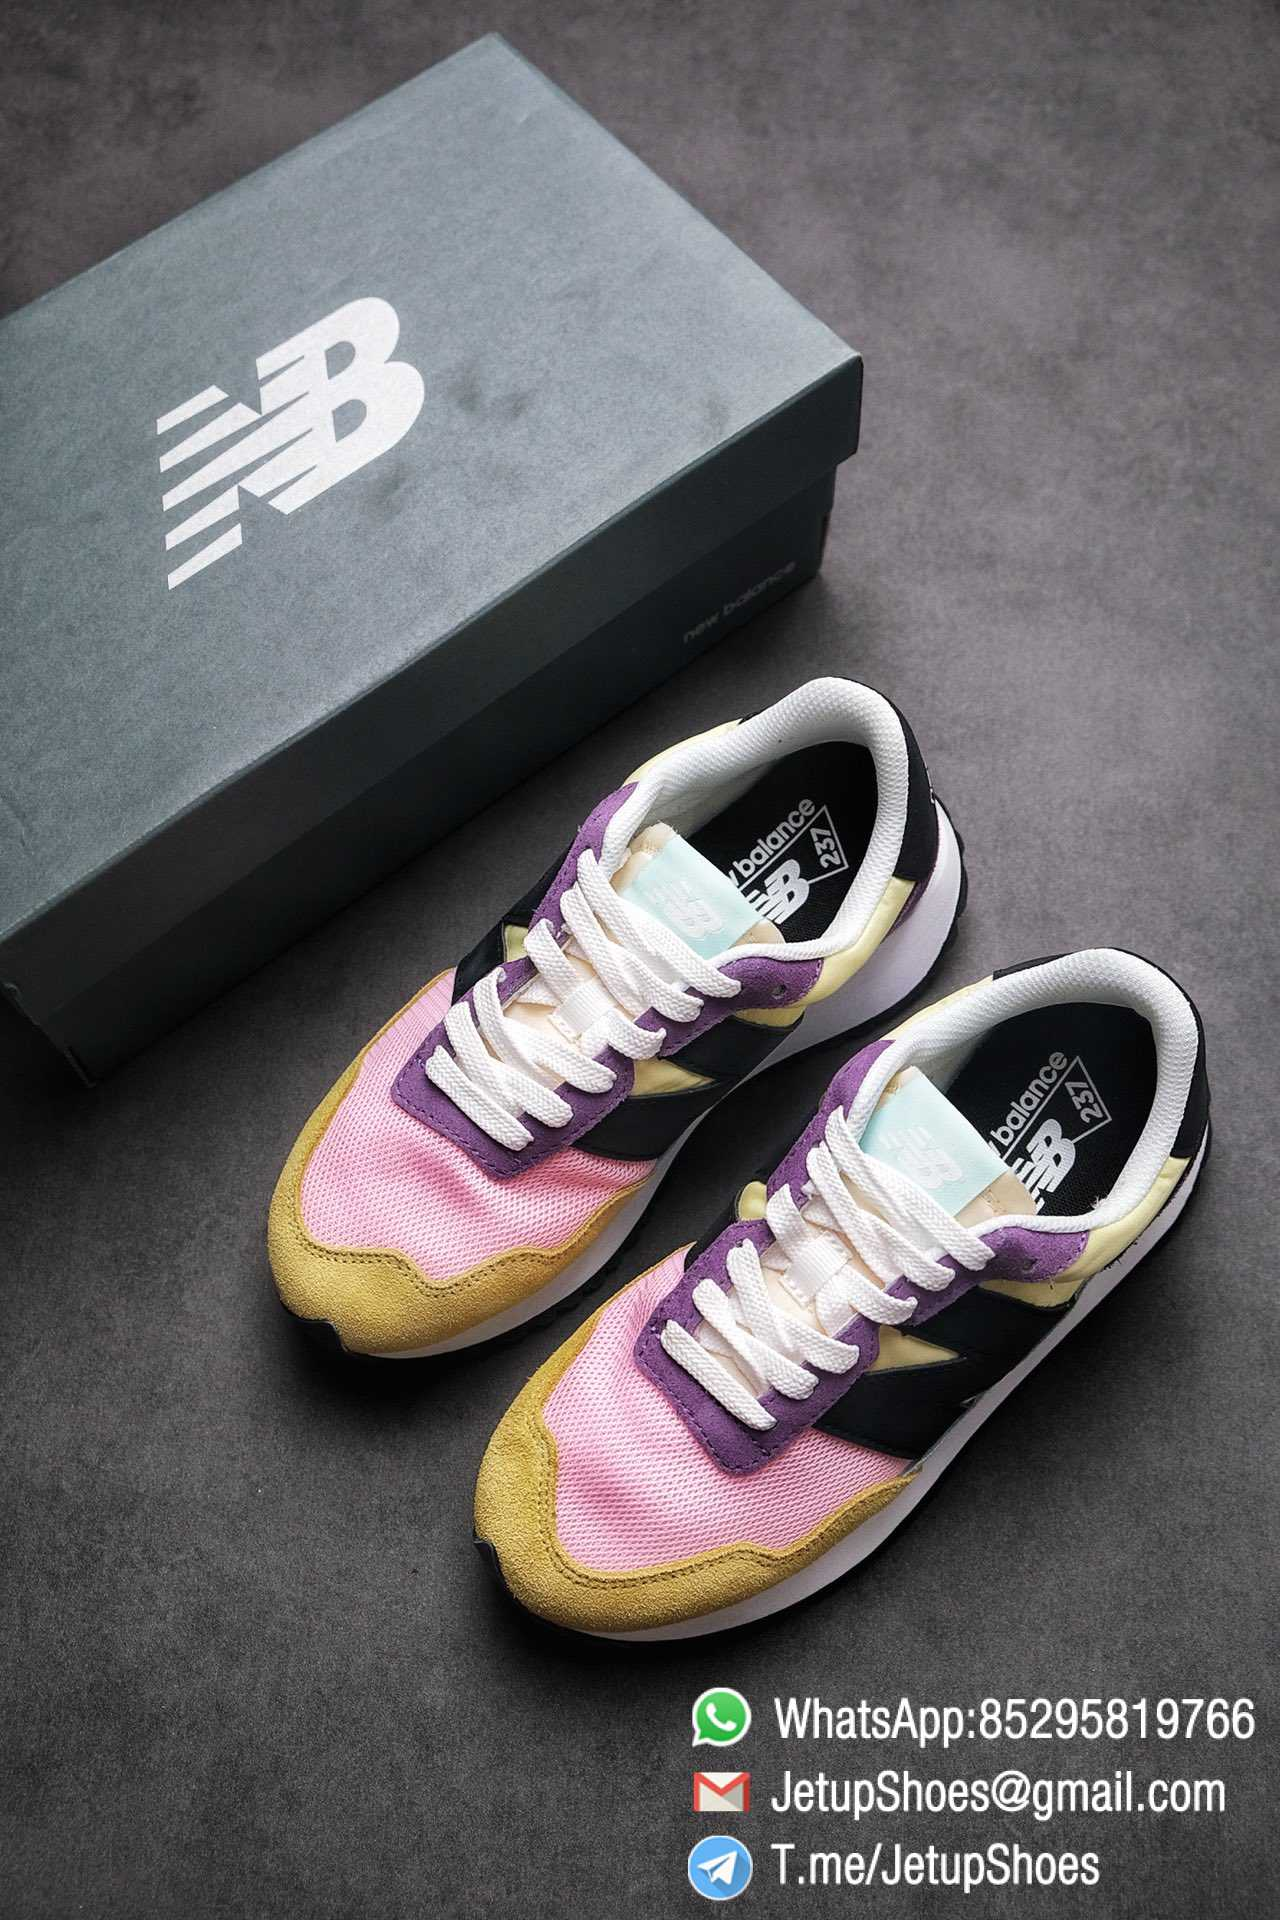 Best Replica 2021 New Balance 237 Yellow Purple Pink SKU MS237LB3 High Quality Running Shoes 04